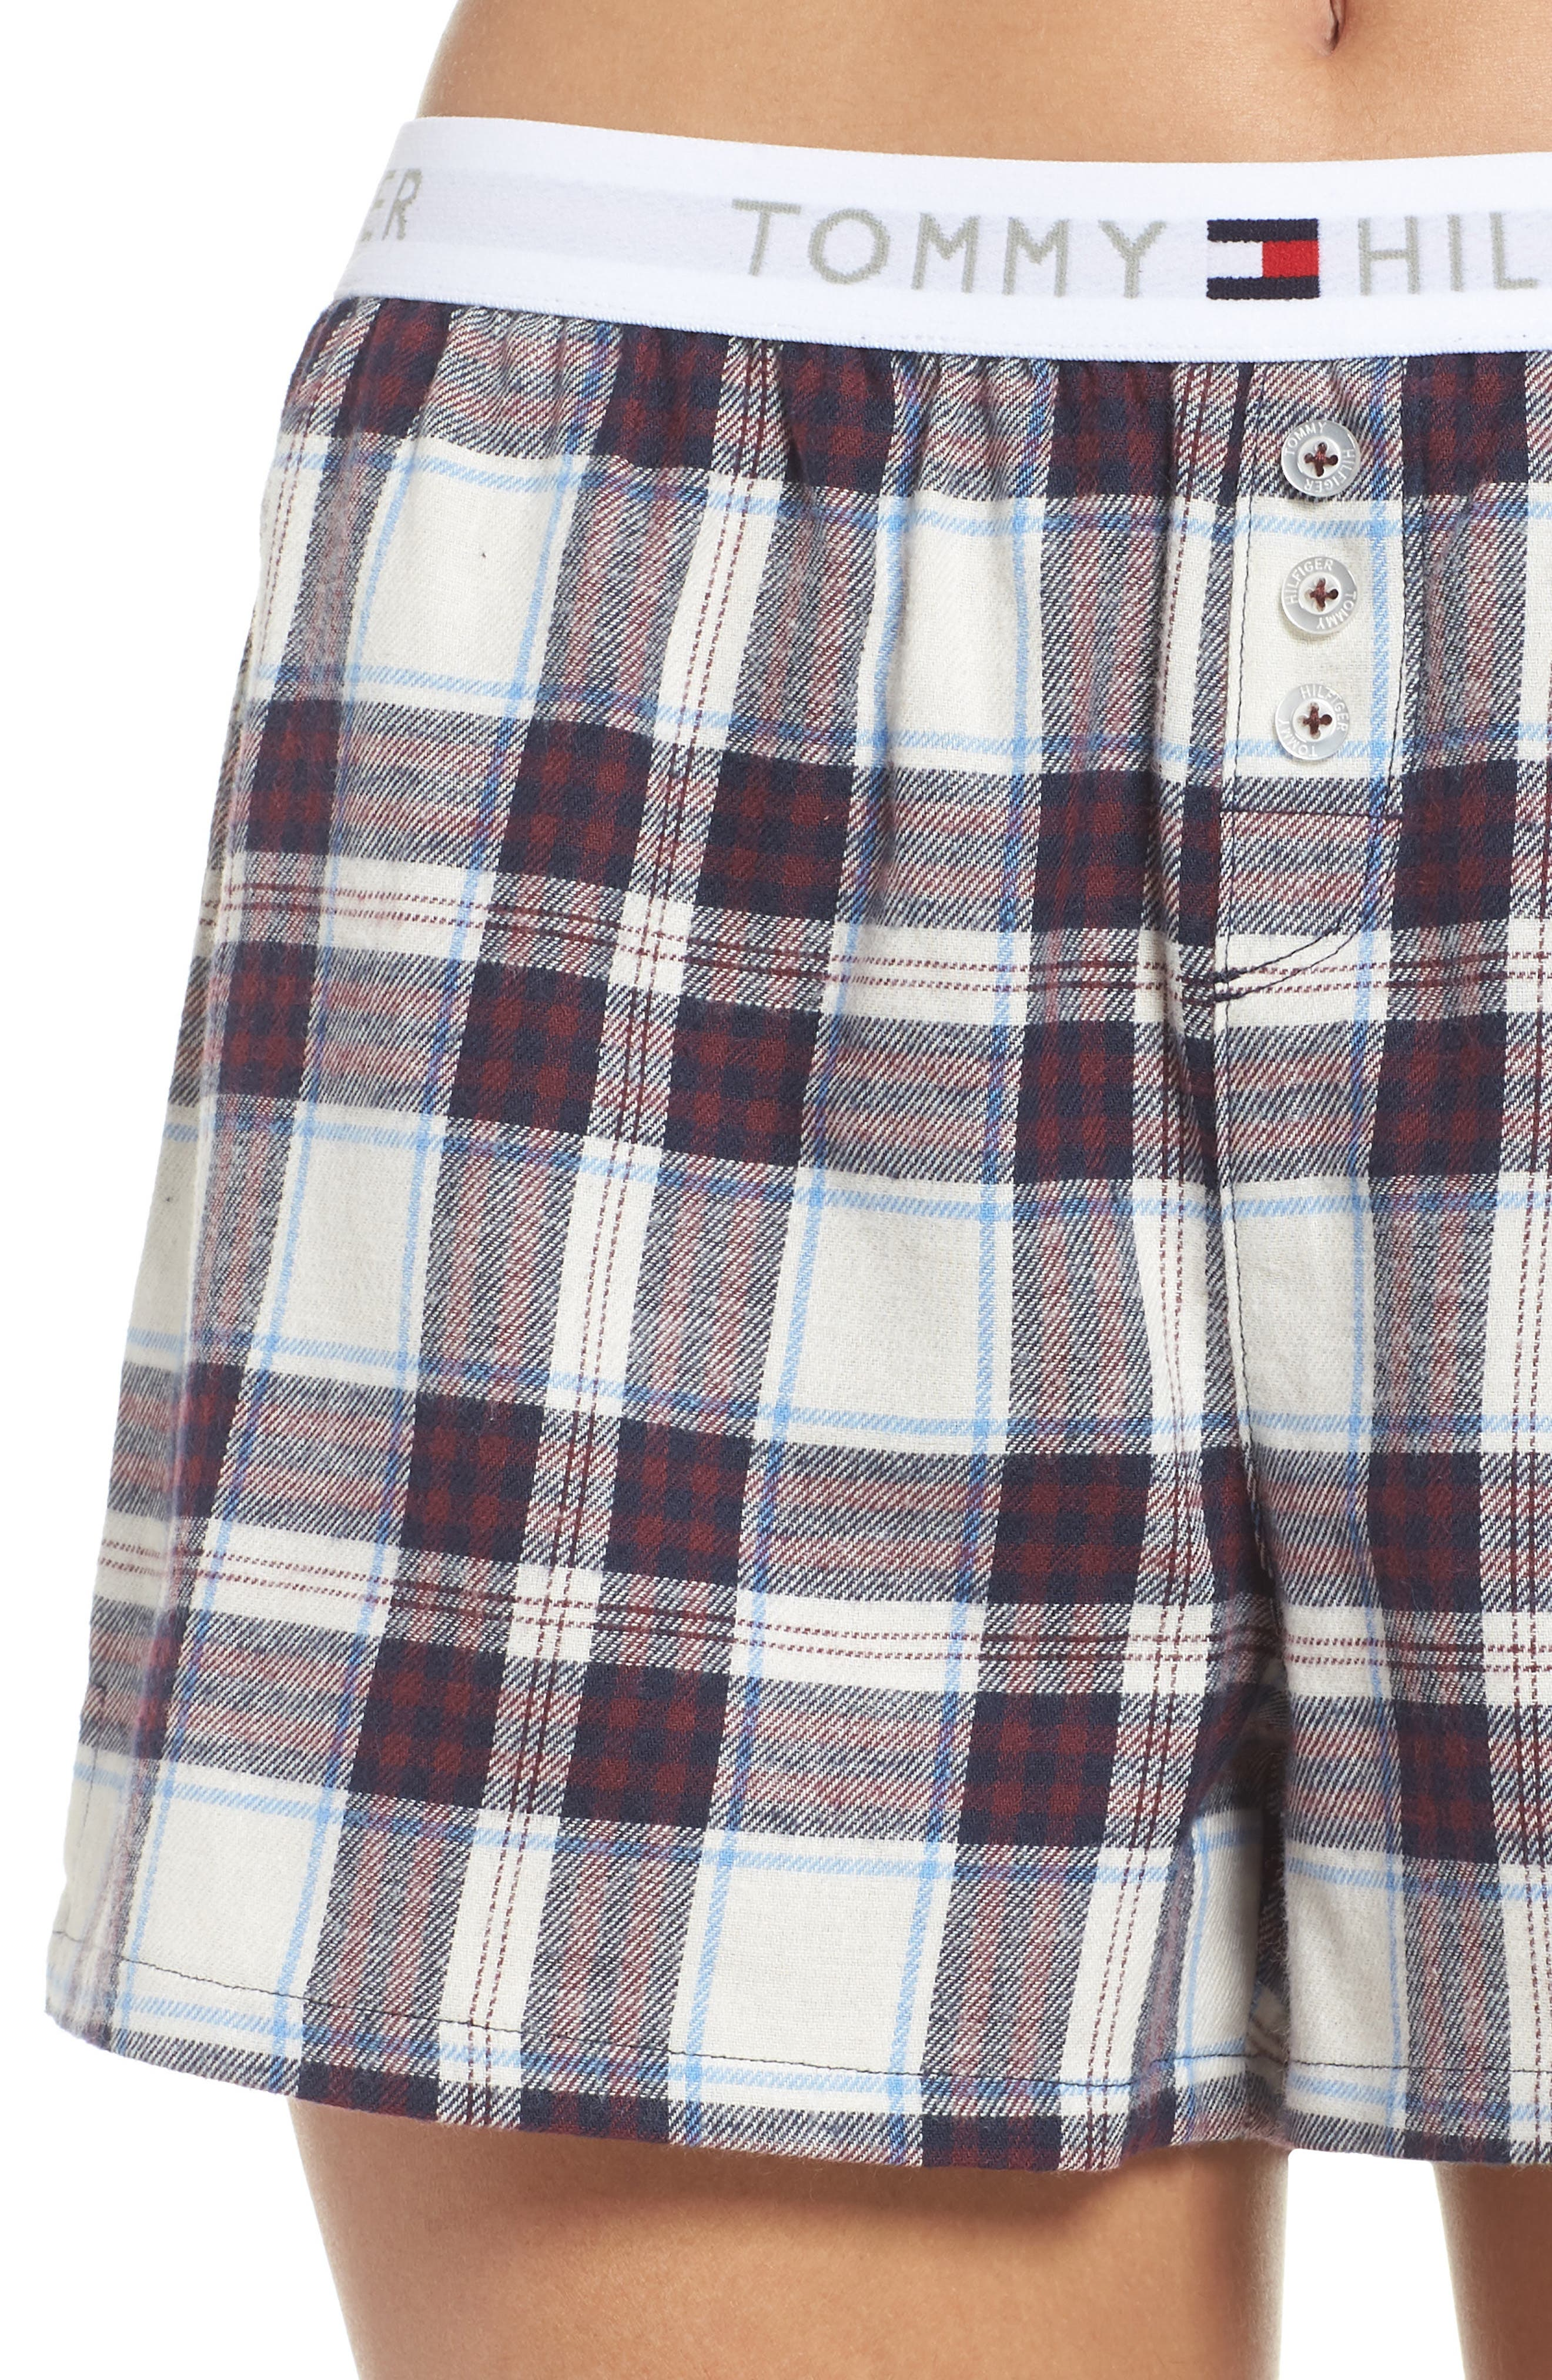 Plaid Pajama Shorts,                             Alternate thumbnail 4, color,                             SWEET DREAMS FIG TARTAN